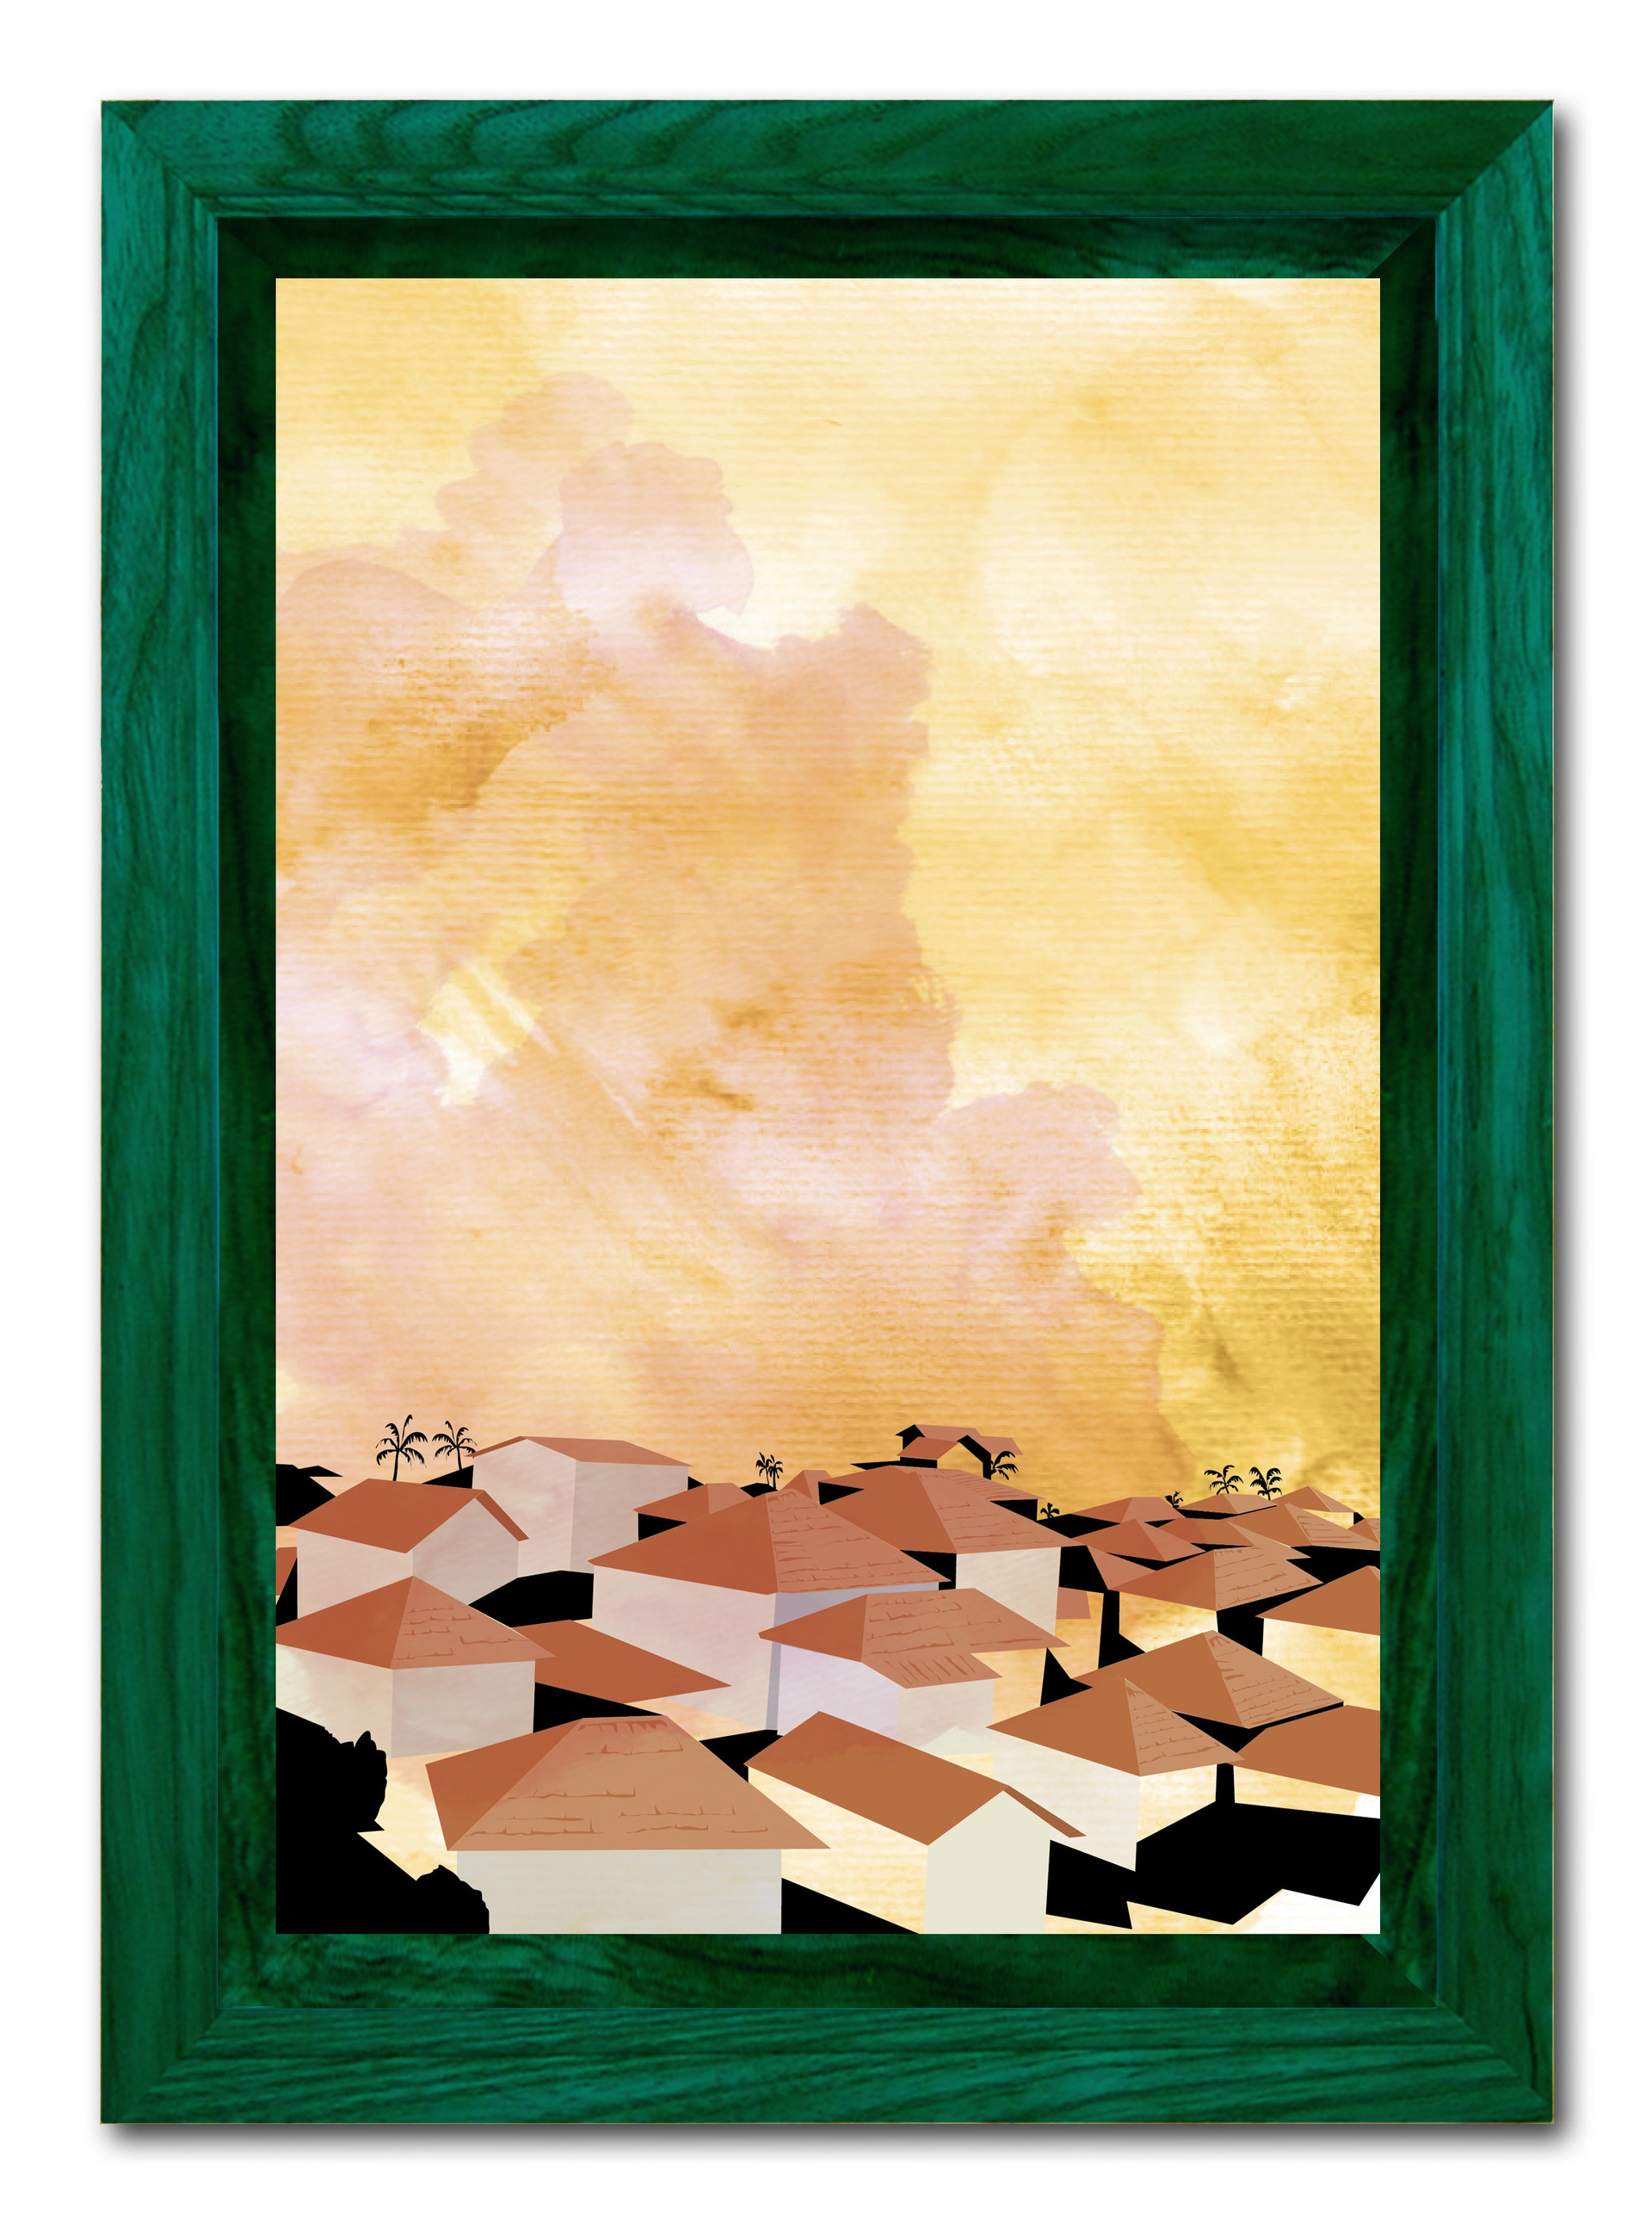 Rajesh r sawant konkan roof tops 2